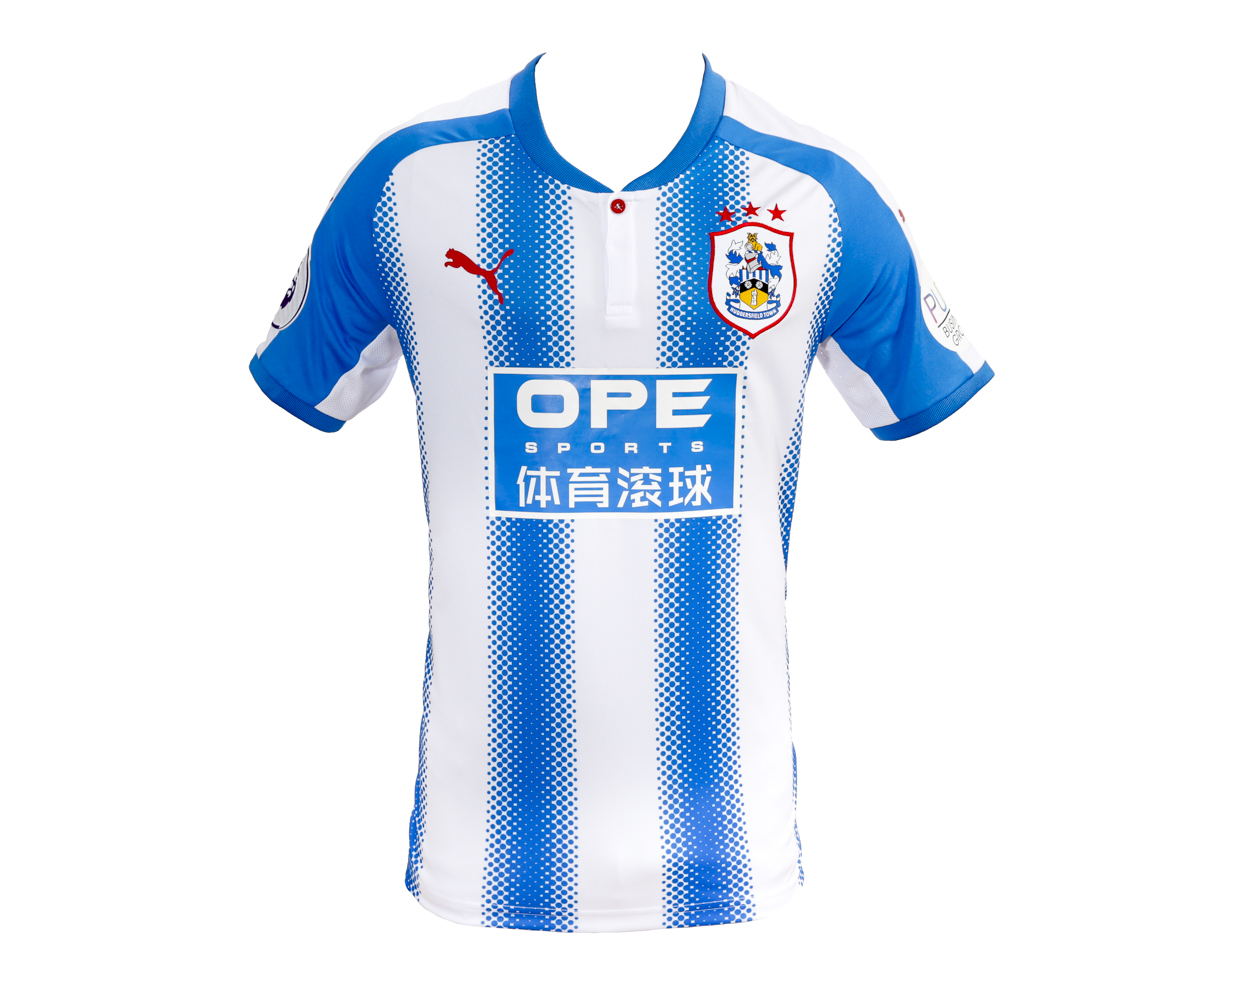 Huddersfield Town 2017 18 Puma Home Kit 17 18 Kits Football Shirt Blog